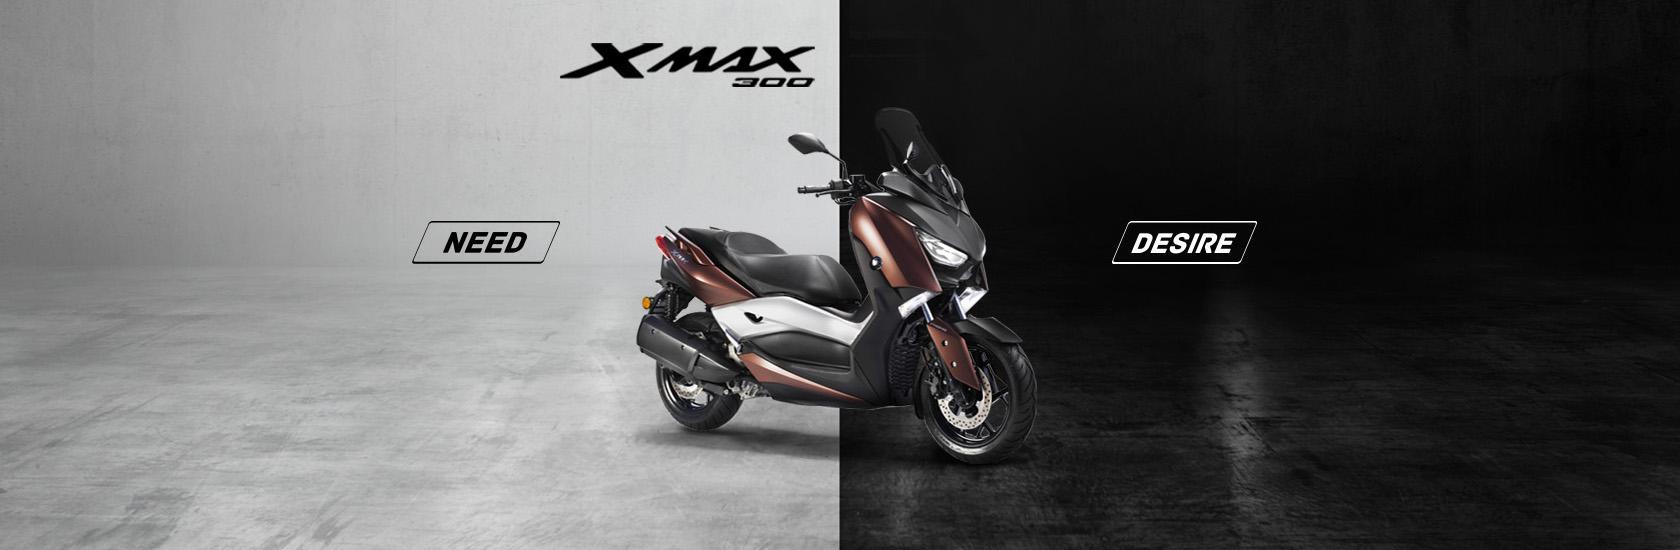 maksi skuterji Yamaha pri KMC-ju